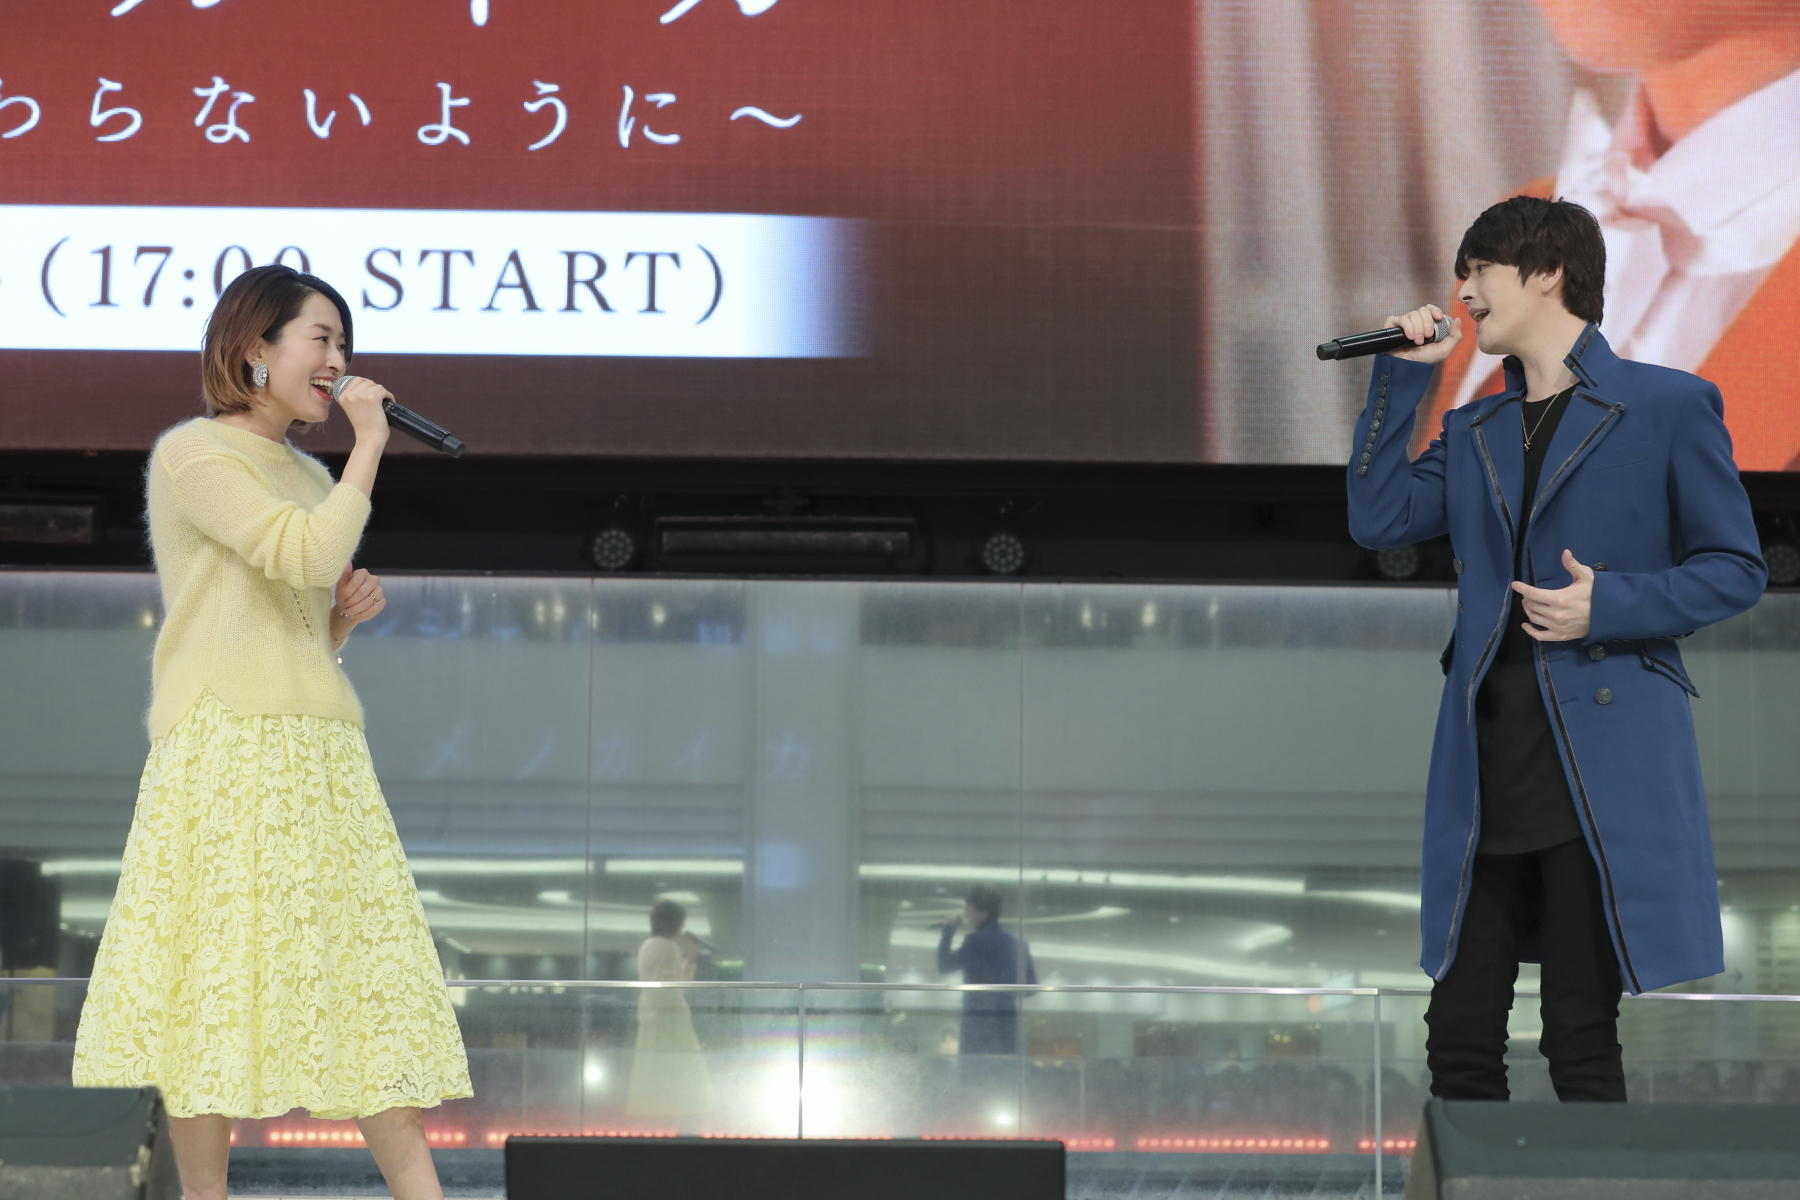 http://news.yoshimoto.co.jp/20180309090439-7fd8cc53d3429de50c09f77bfb9960d1ab61355a.jpg